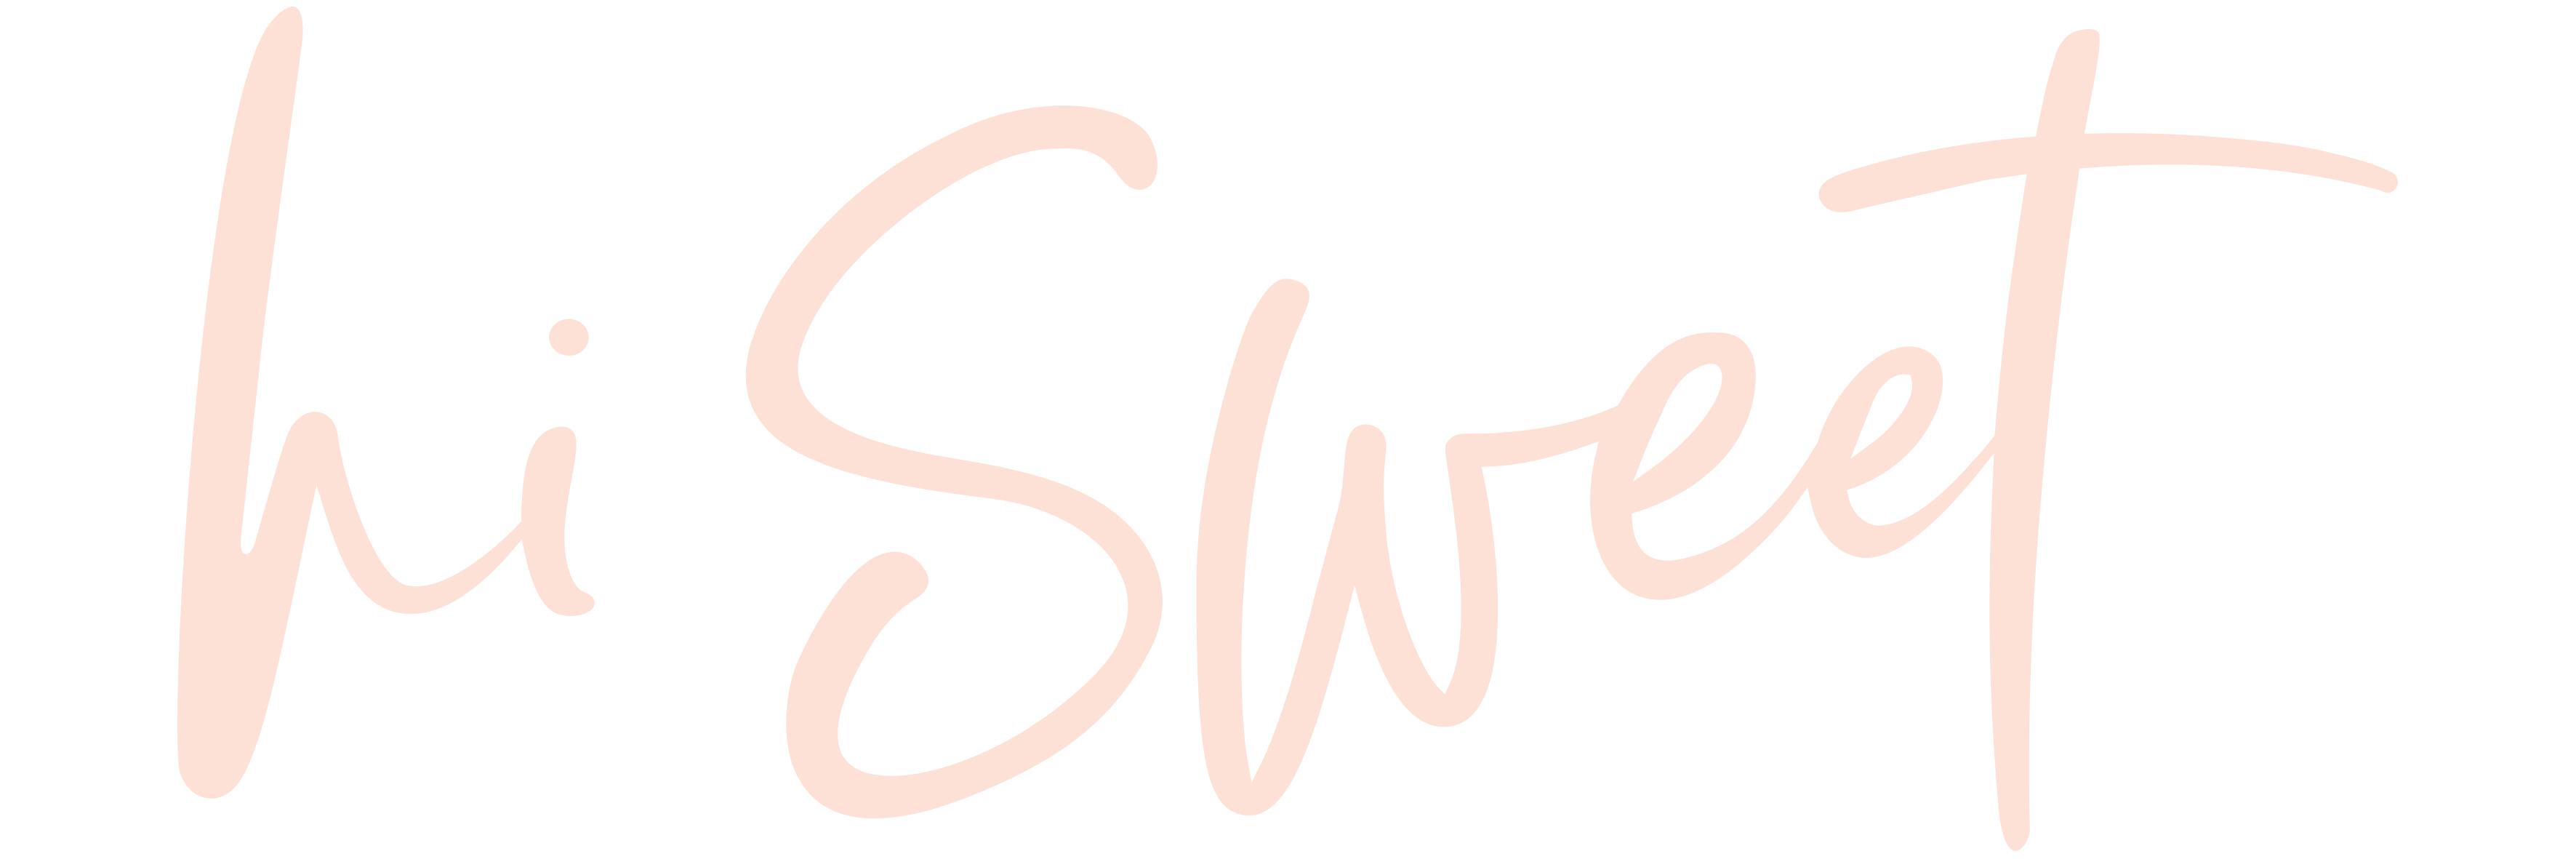 Hi Sweet